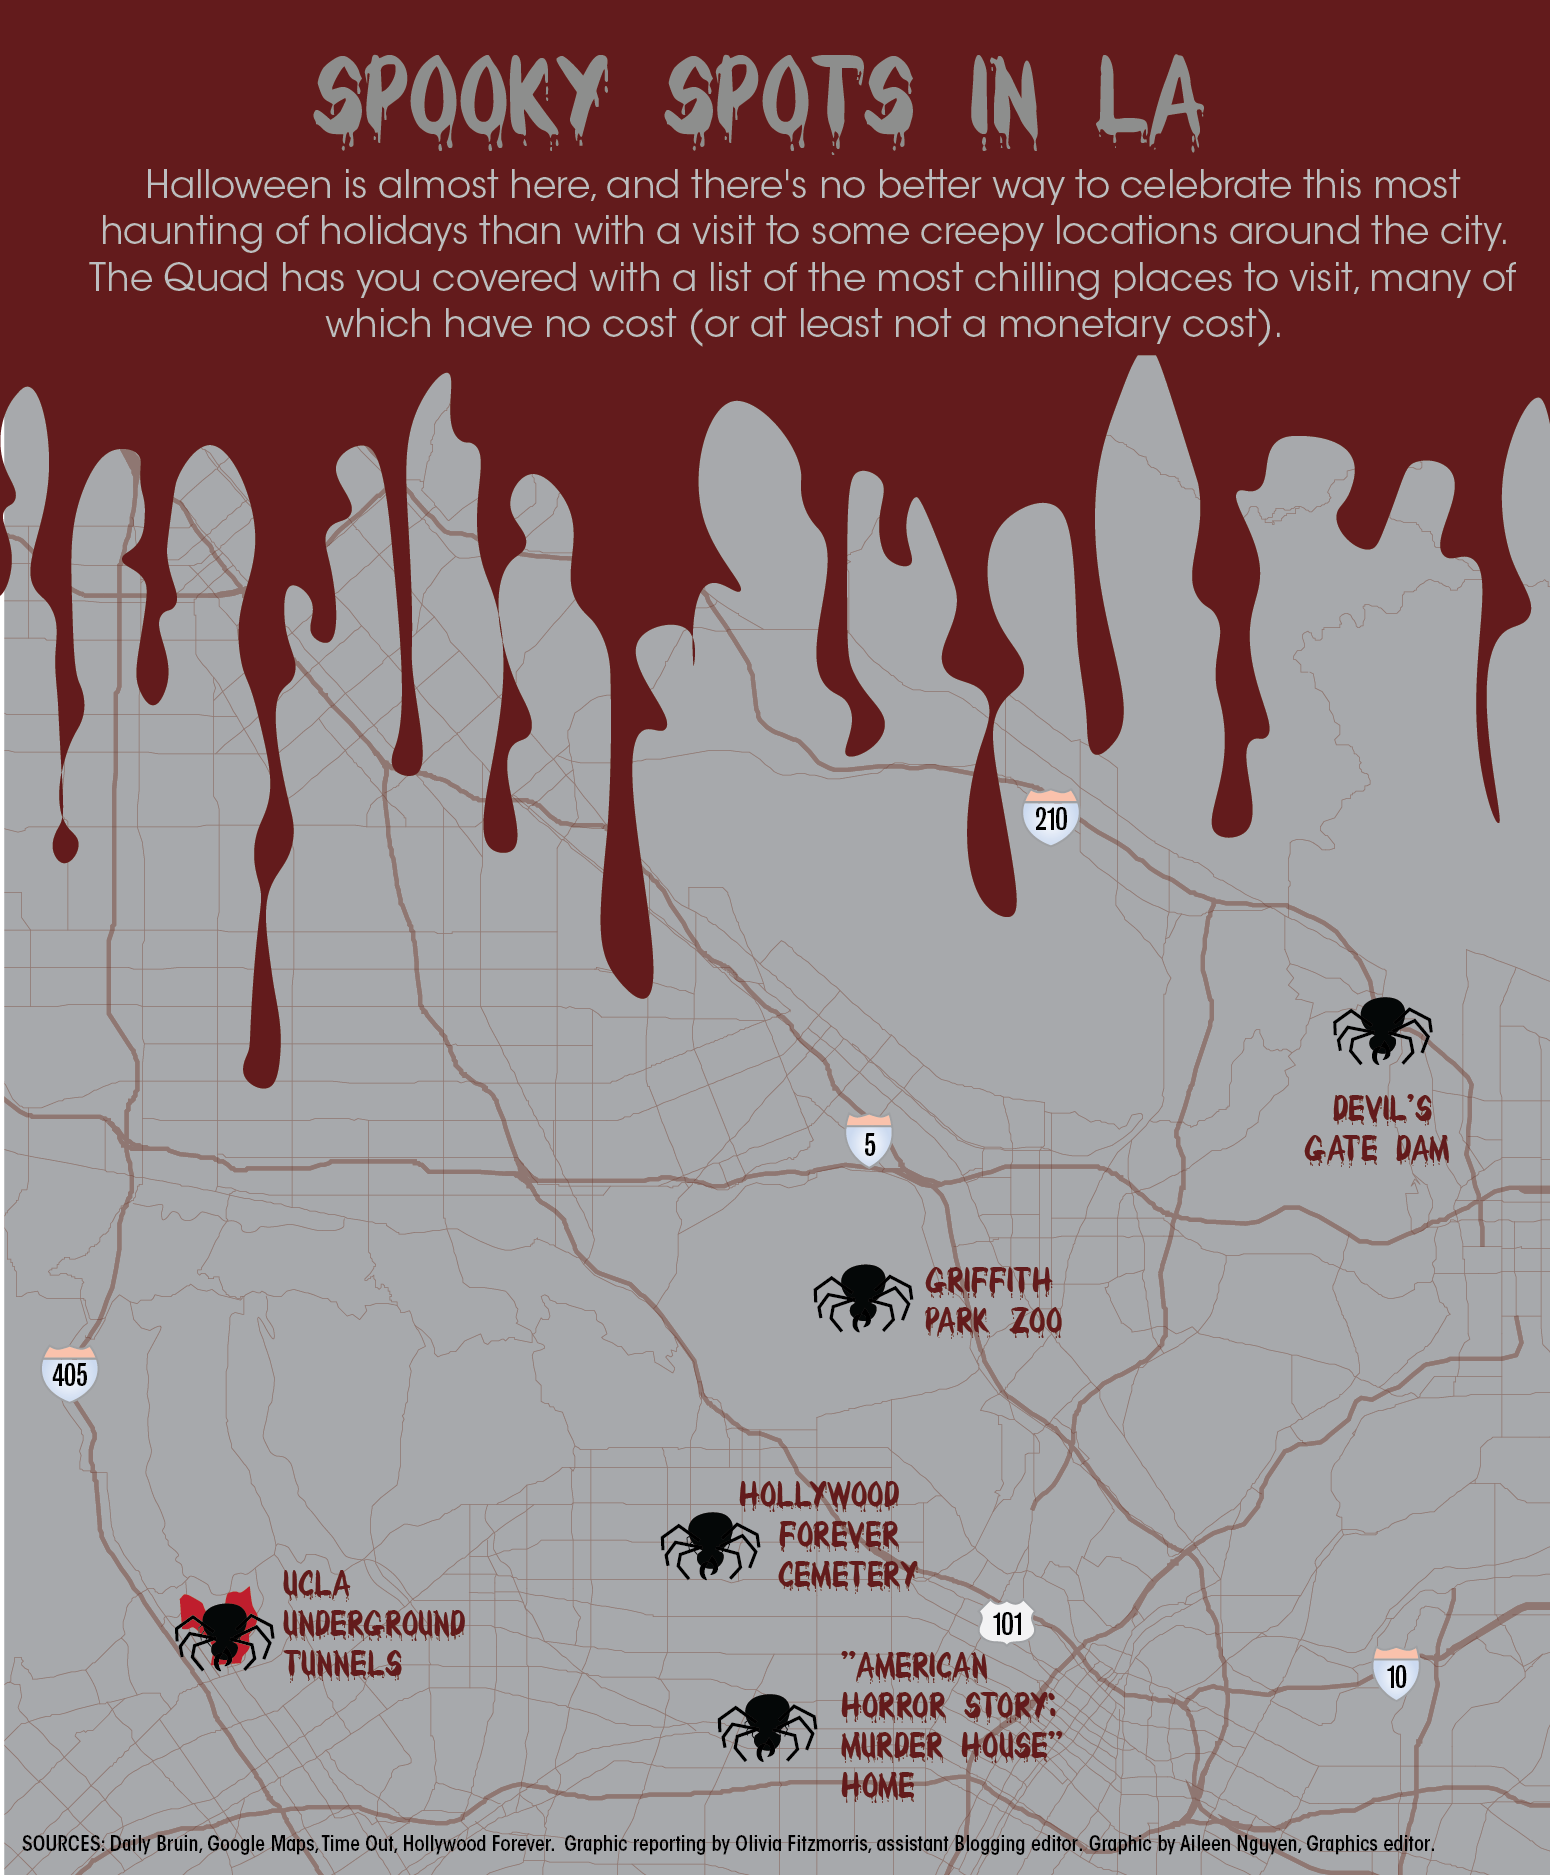 Halloween At Ucla 2020 The Quad: Exploring Los Angeles' spookiest haunts this Halloween